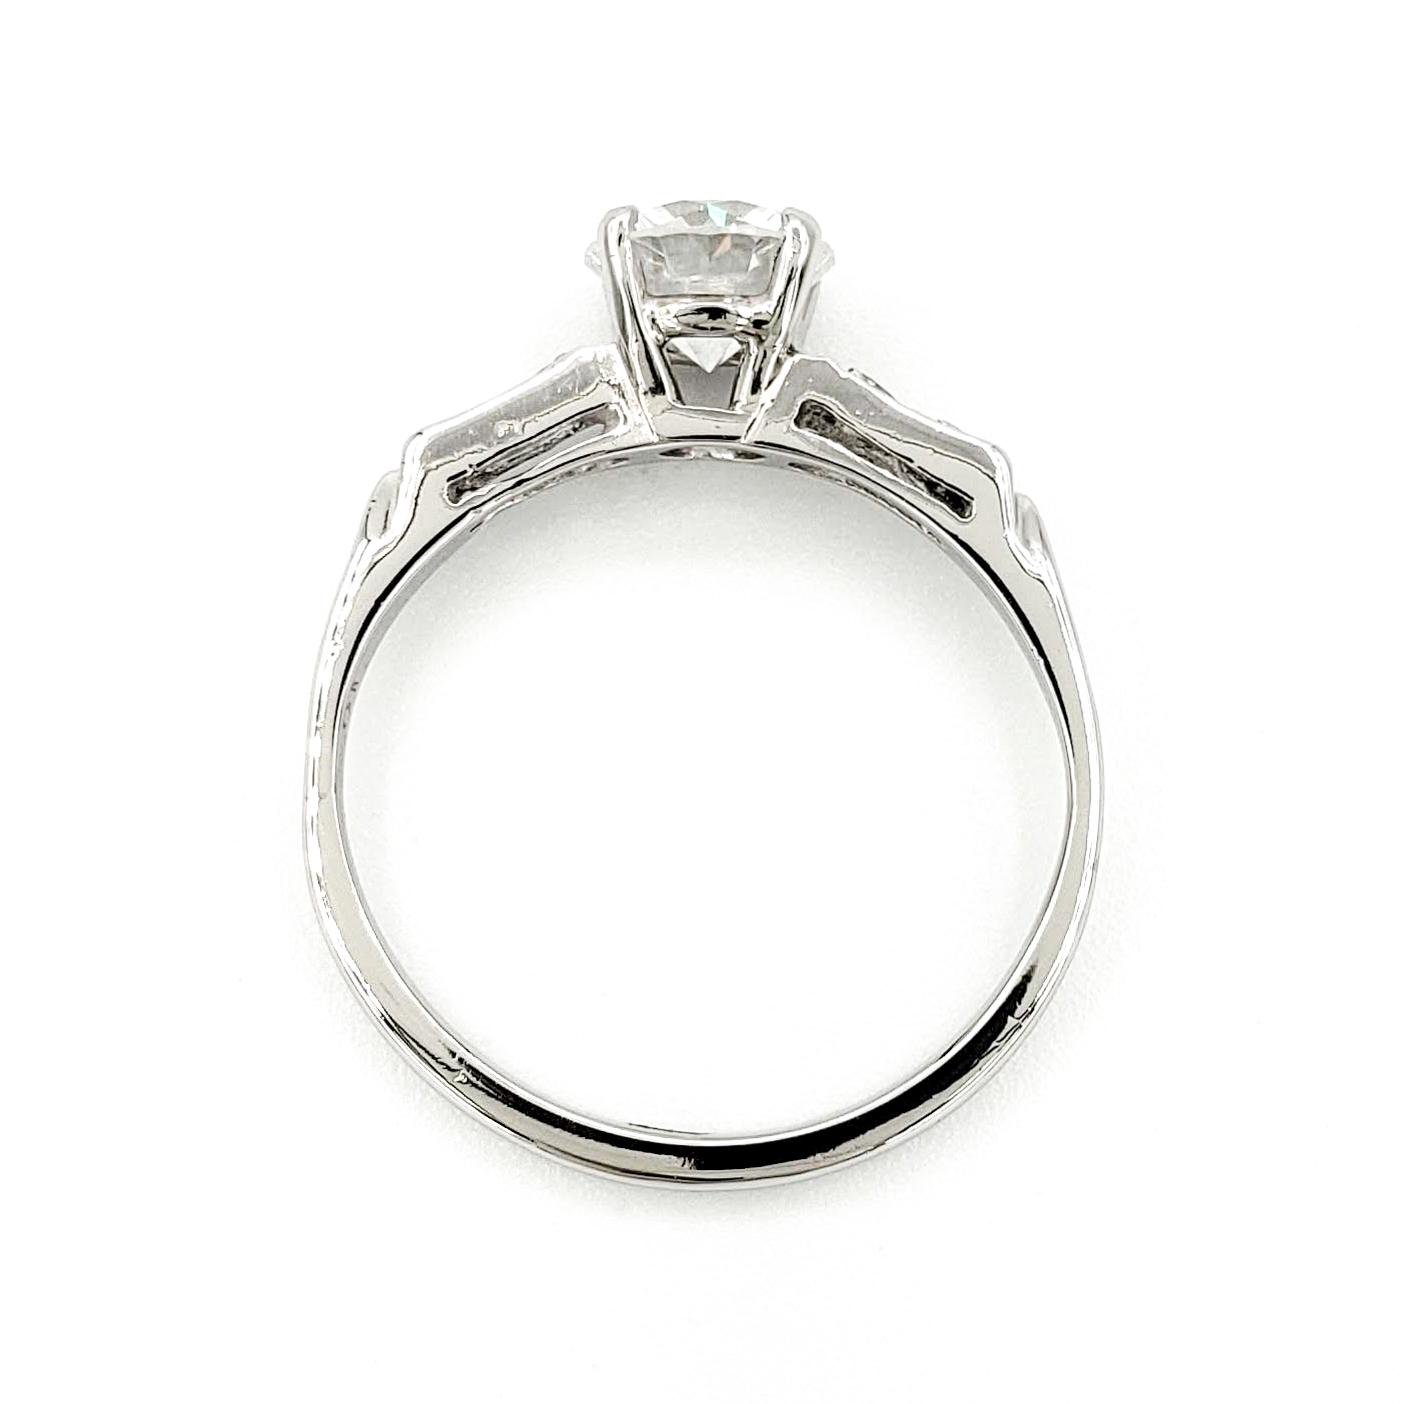 vintage-platinum-engagement-ring-with-1-01-carat-round-brilliant-cut-diamond-egl-d-si3